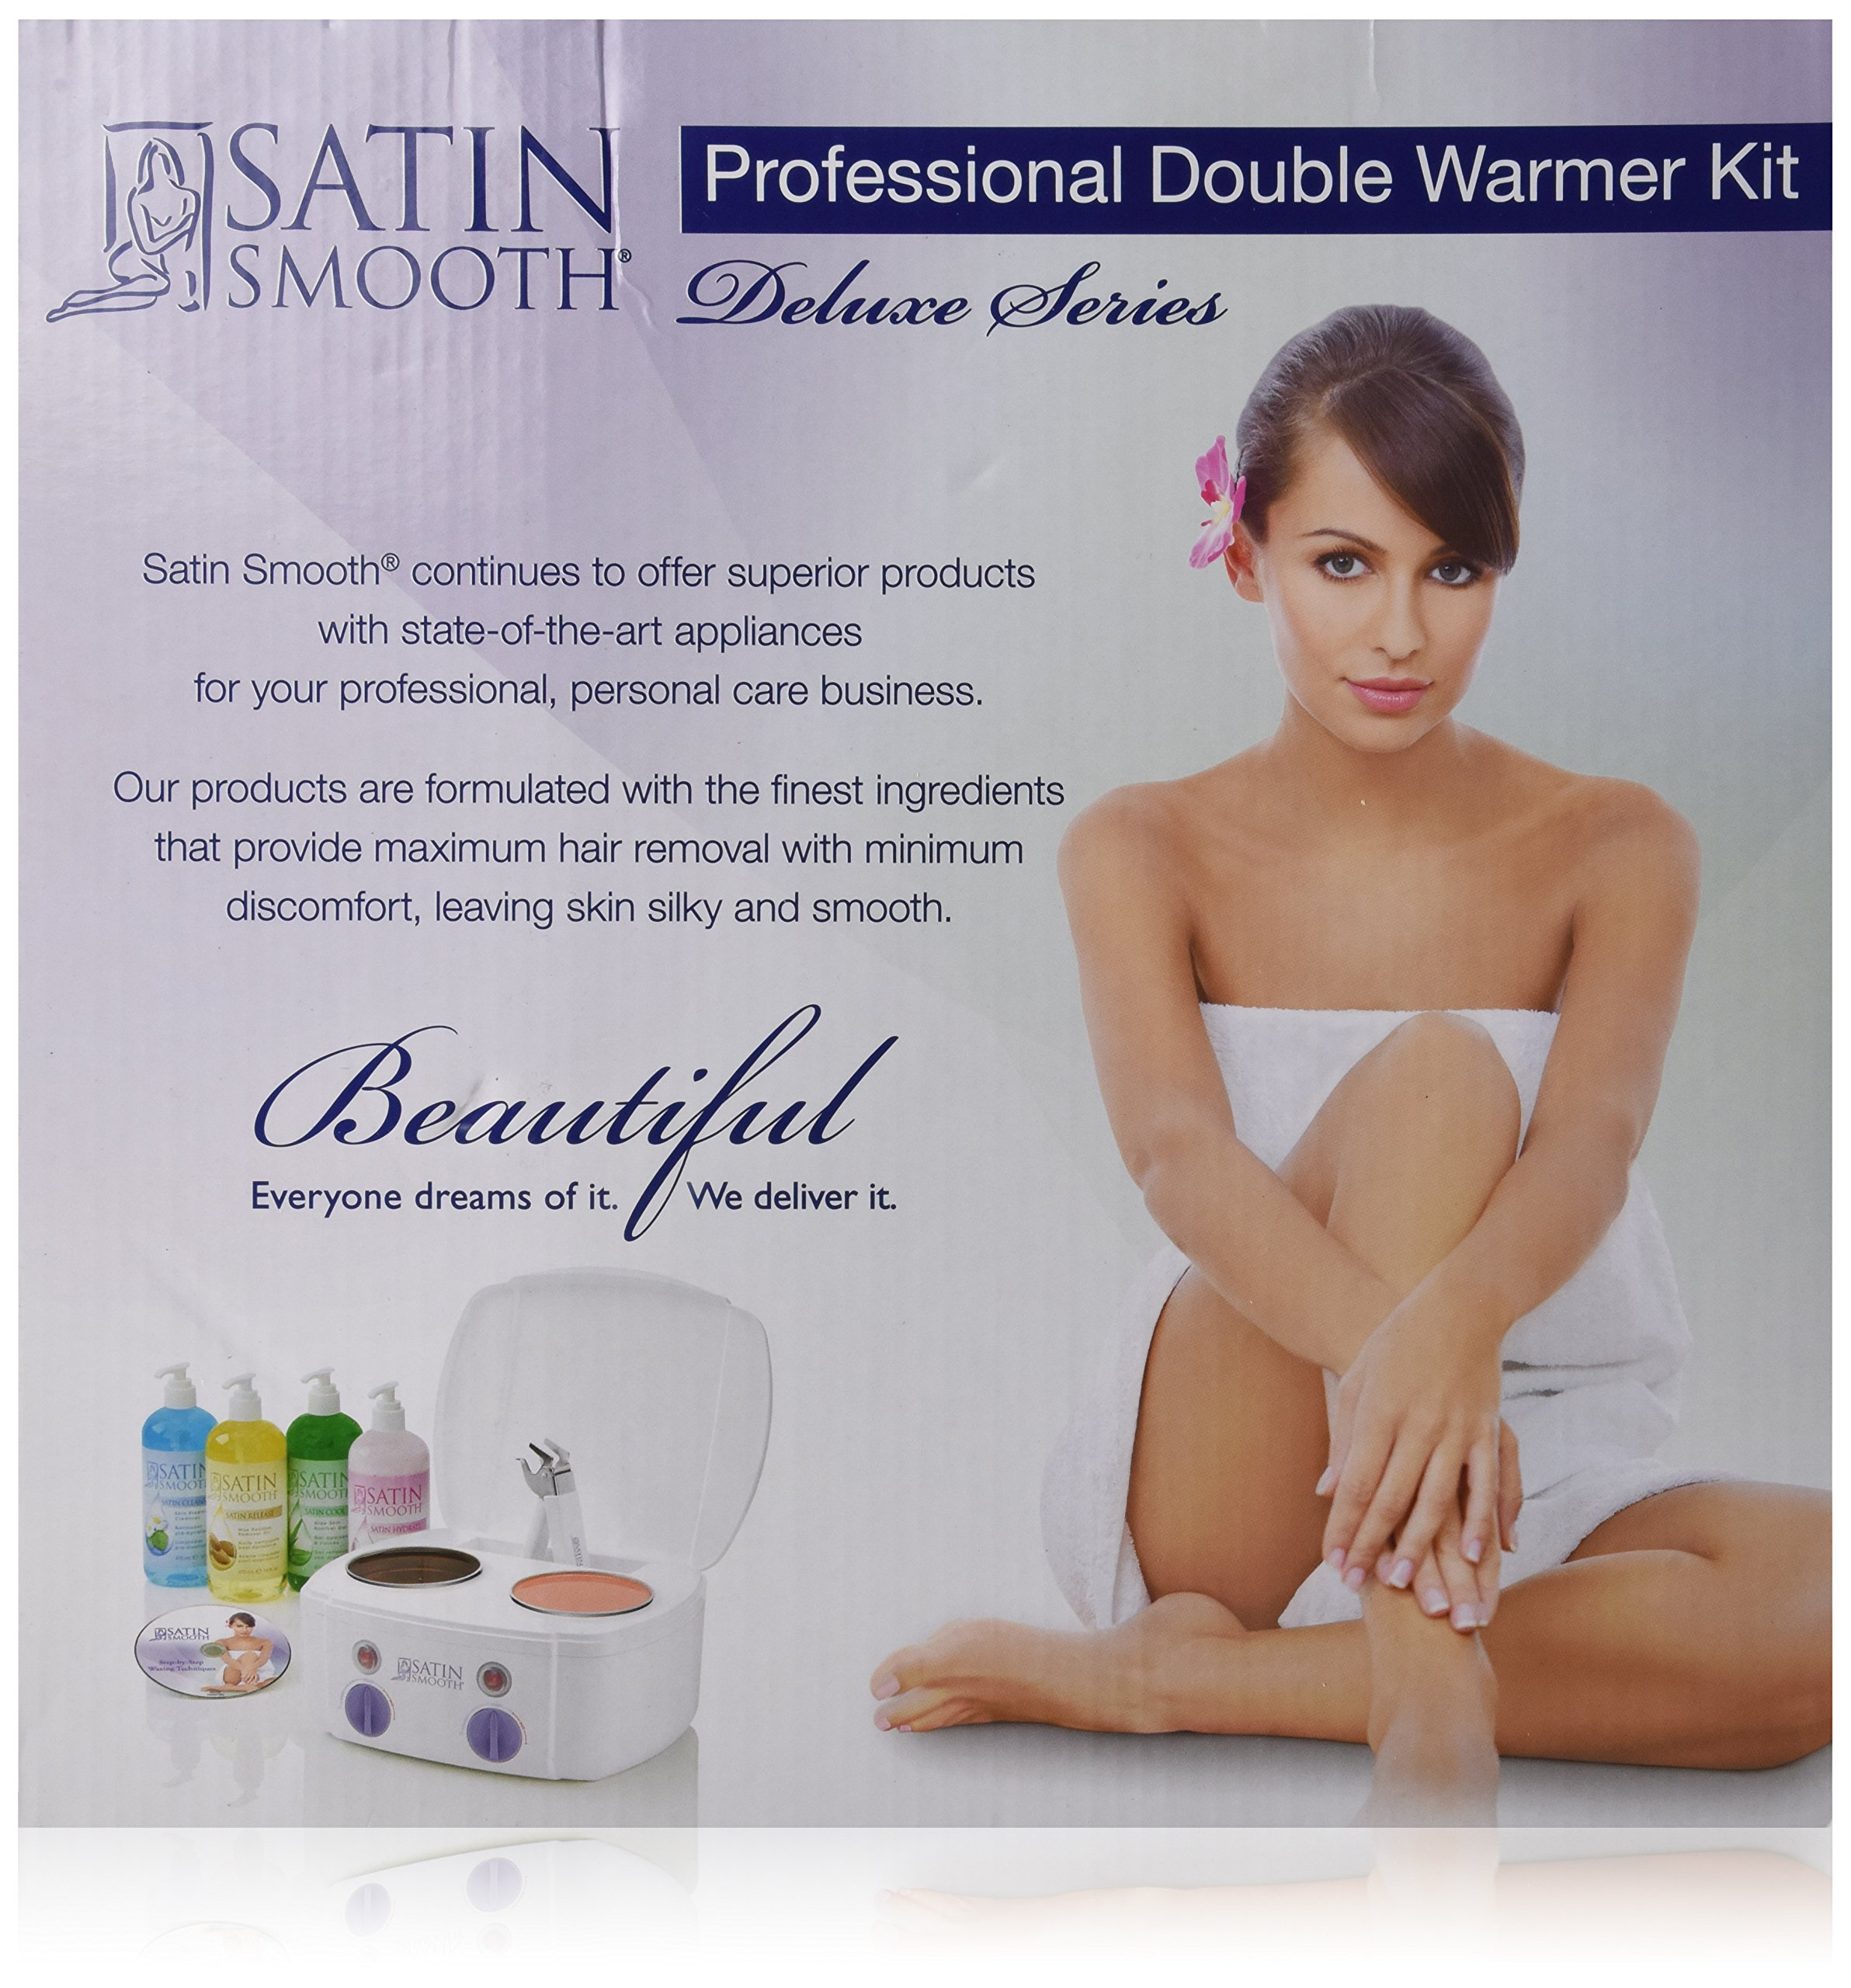 Satin Smooth Double Wax Warmer Kit